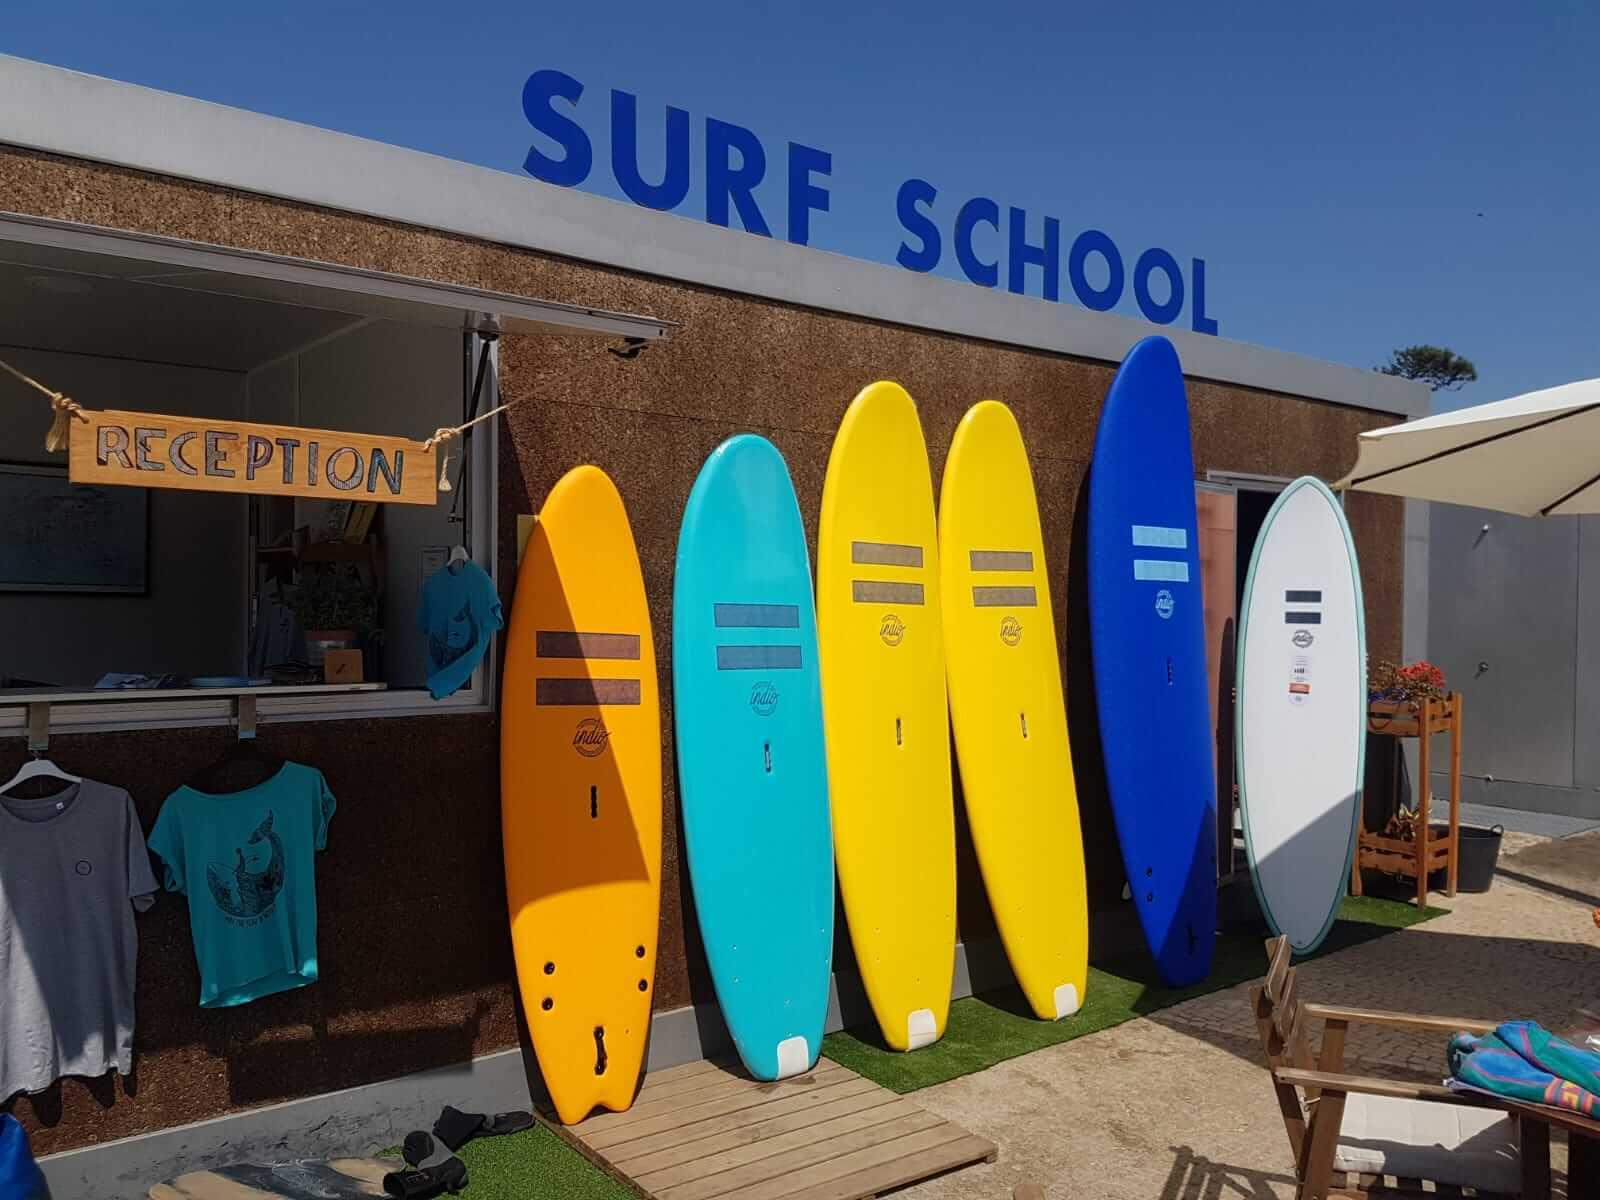 Surfcamp SALT FLOW - Surf School in Esposende, funda, Portugal